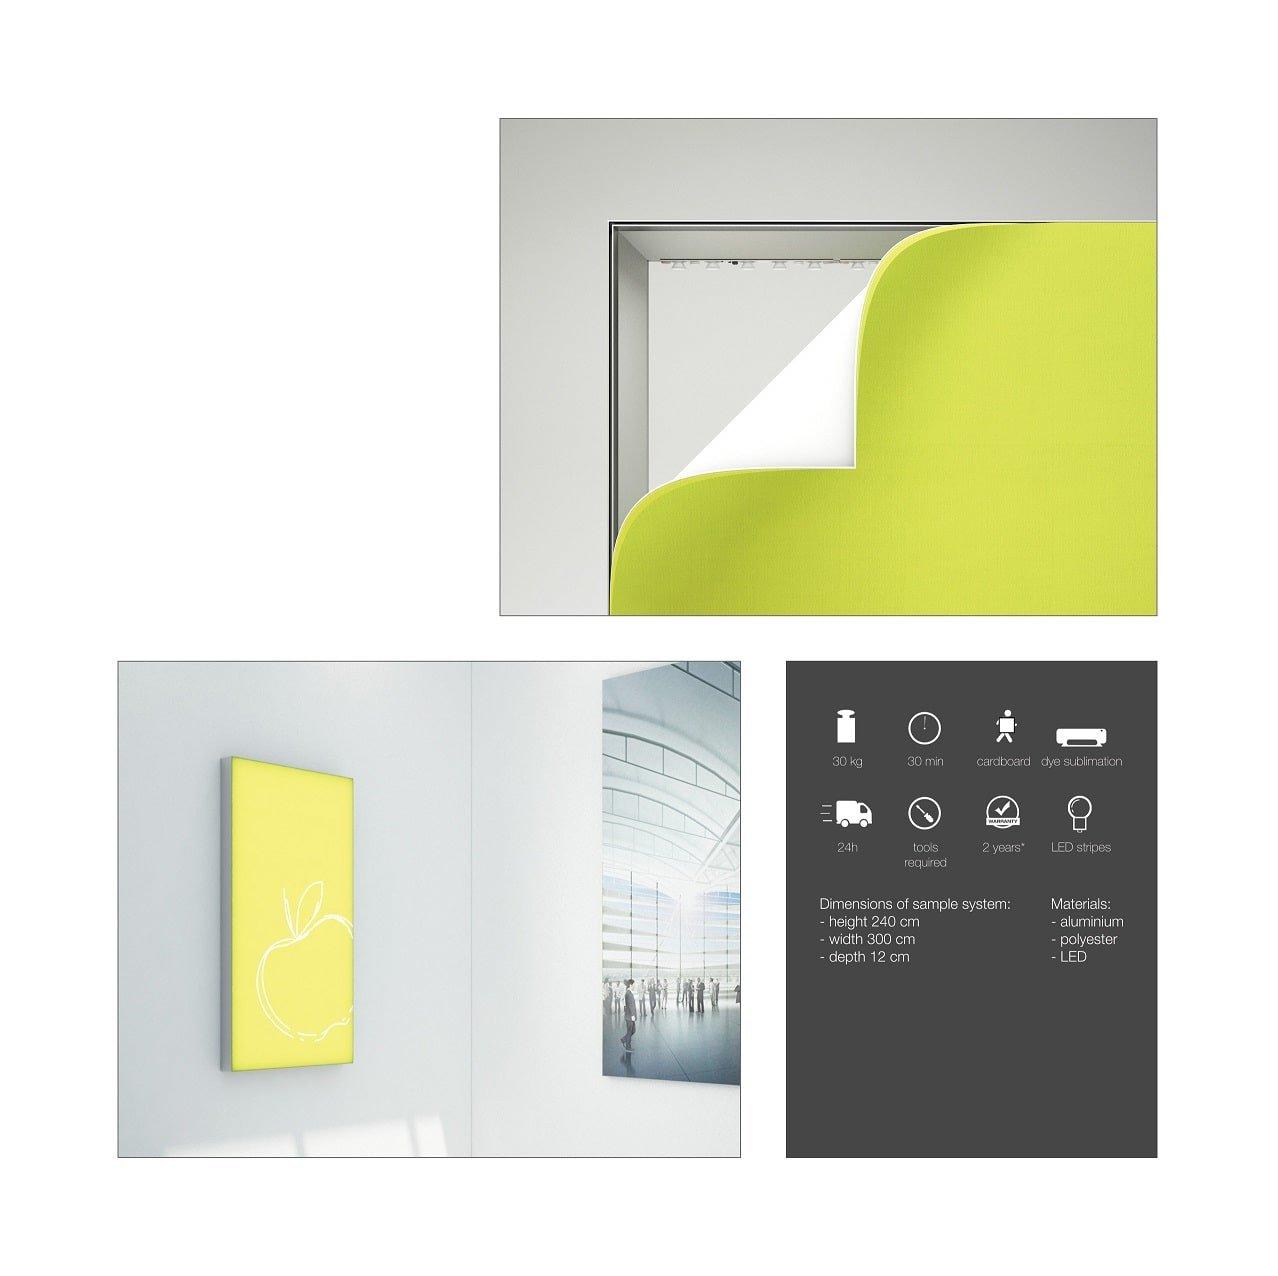 Freestanding LED Fabric Lightbox